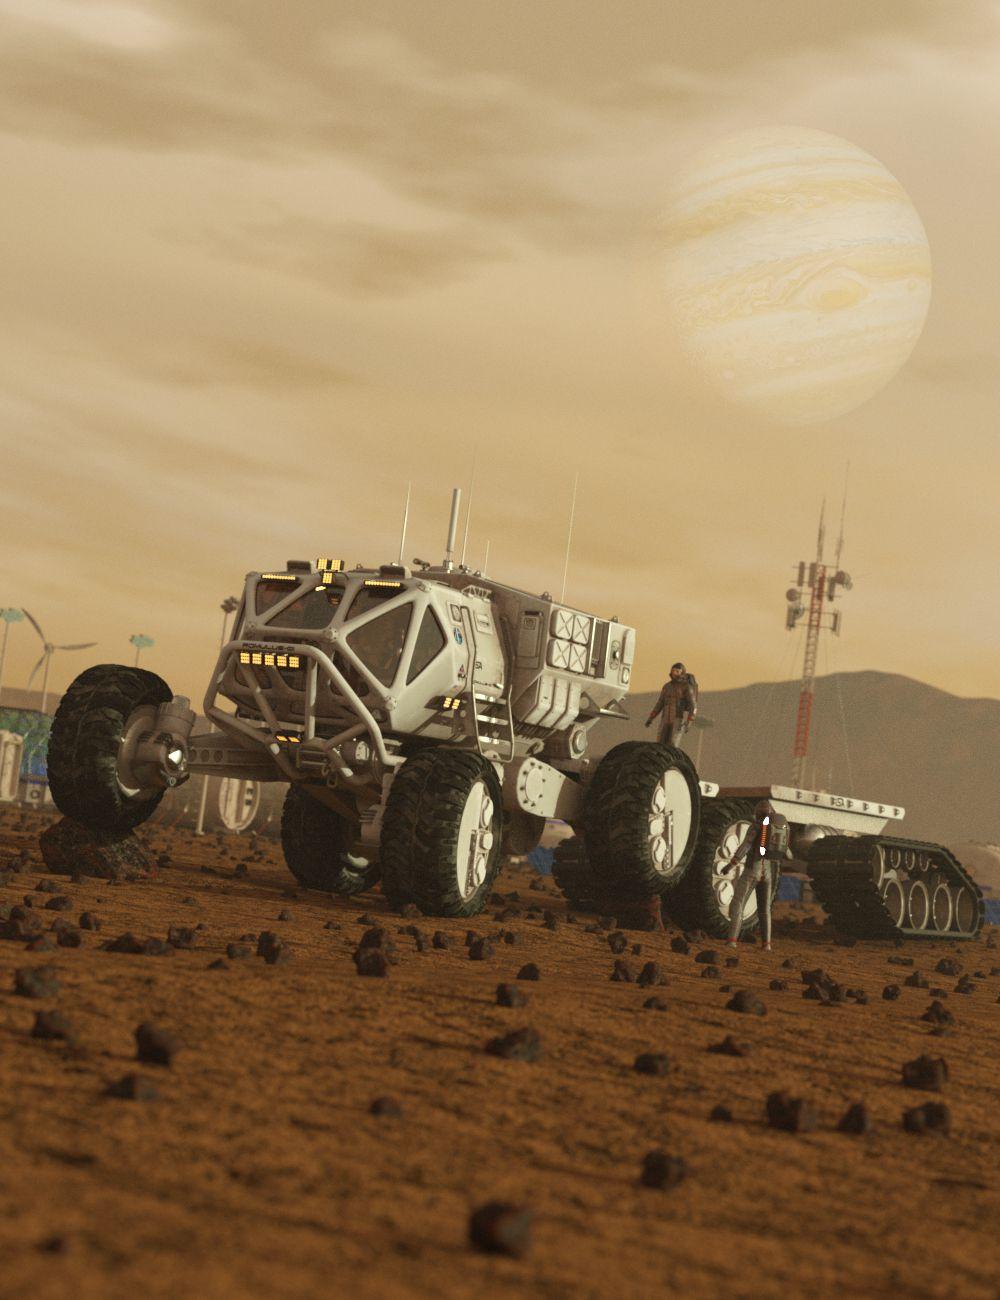 Romulus-01 Rover by: DzFire, 3D Models by Daz 3D